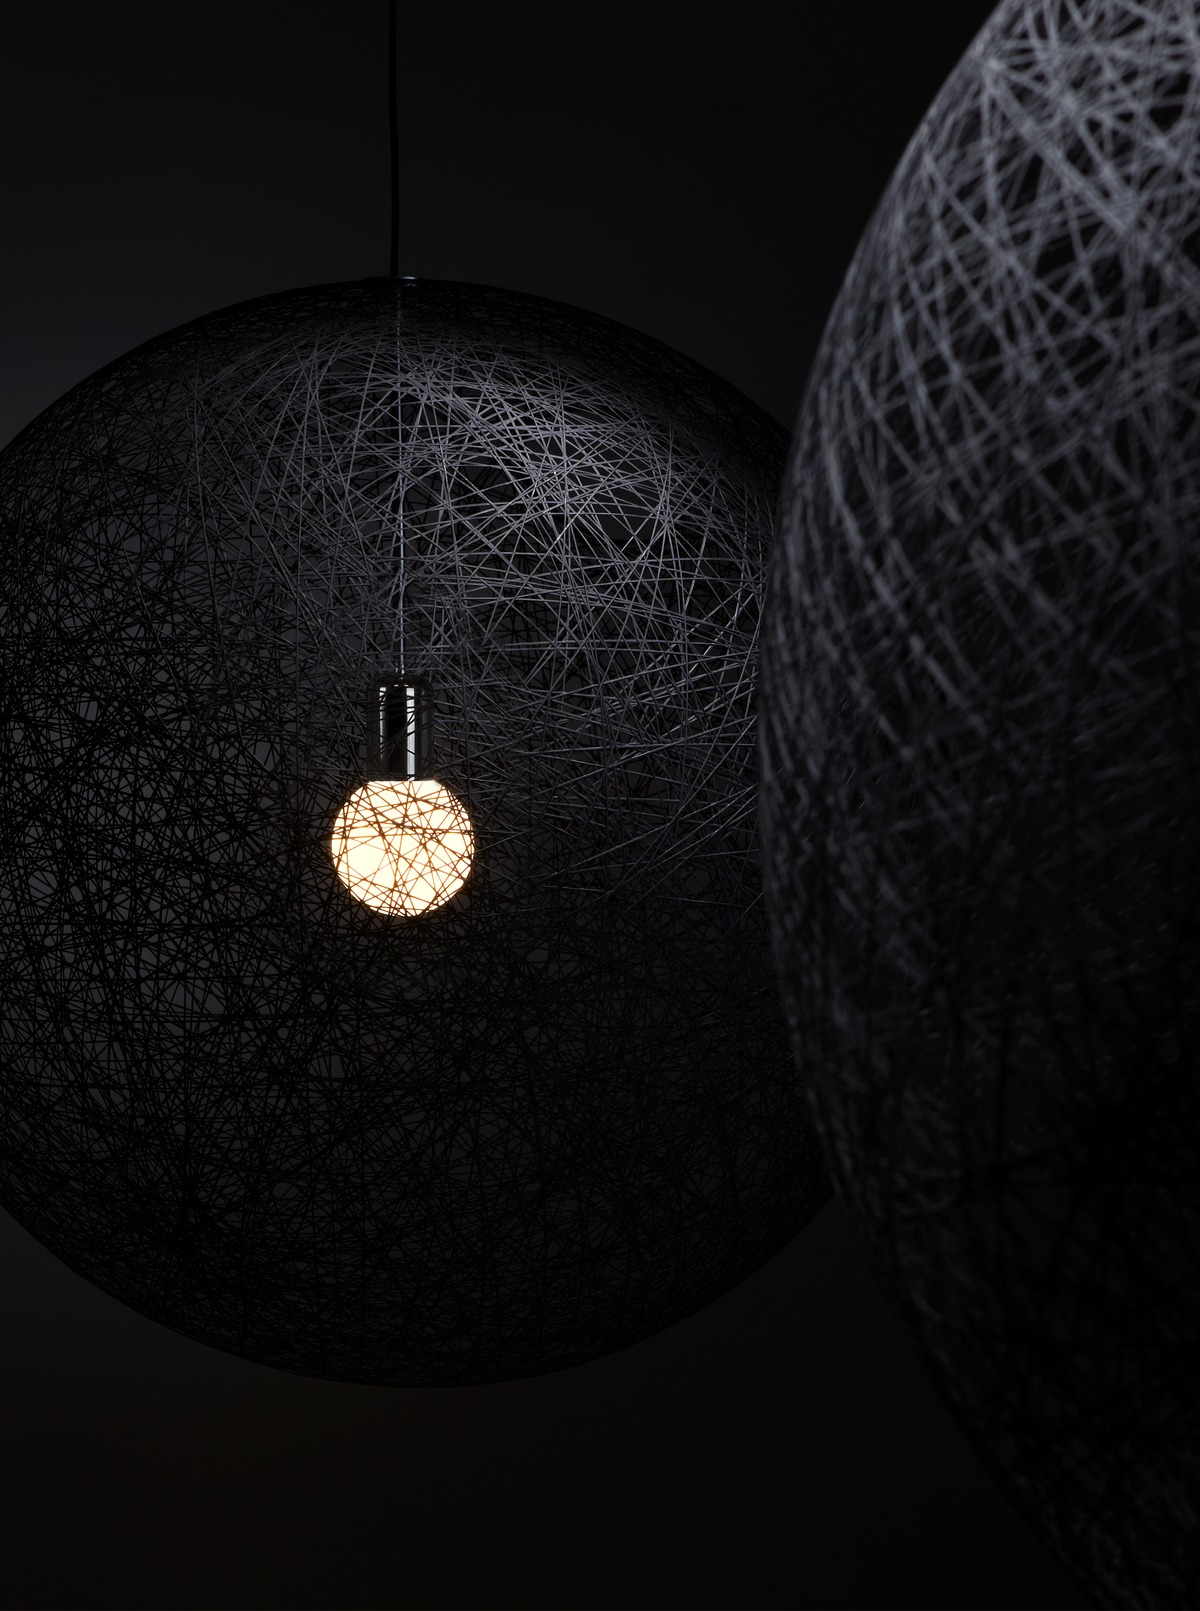 Random Light II suspension black with black background